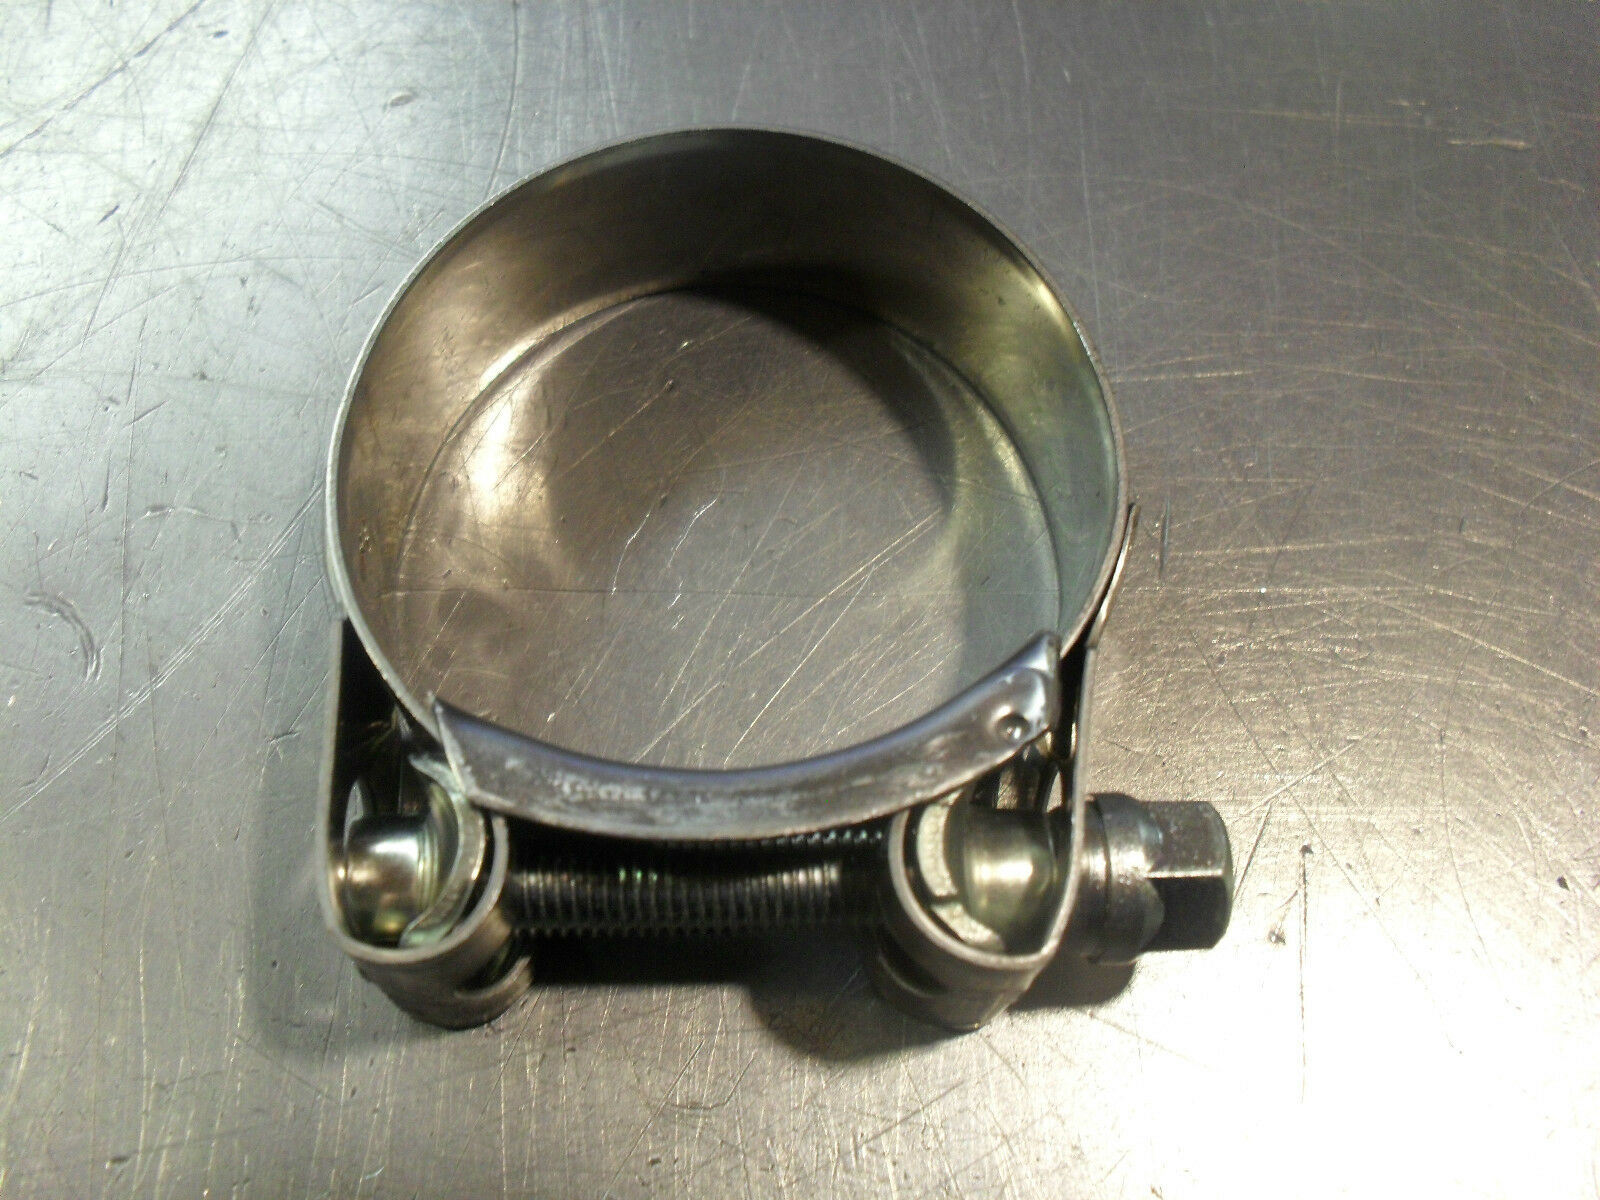 For Yamaha XJ 600 1984-1991 Exhaust Collector Box Seal /& Clamp to Silencer 1